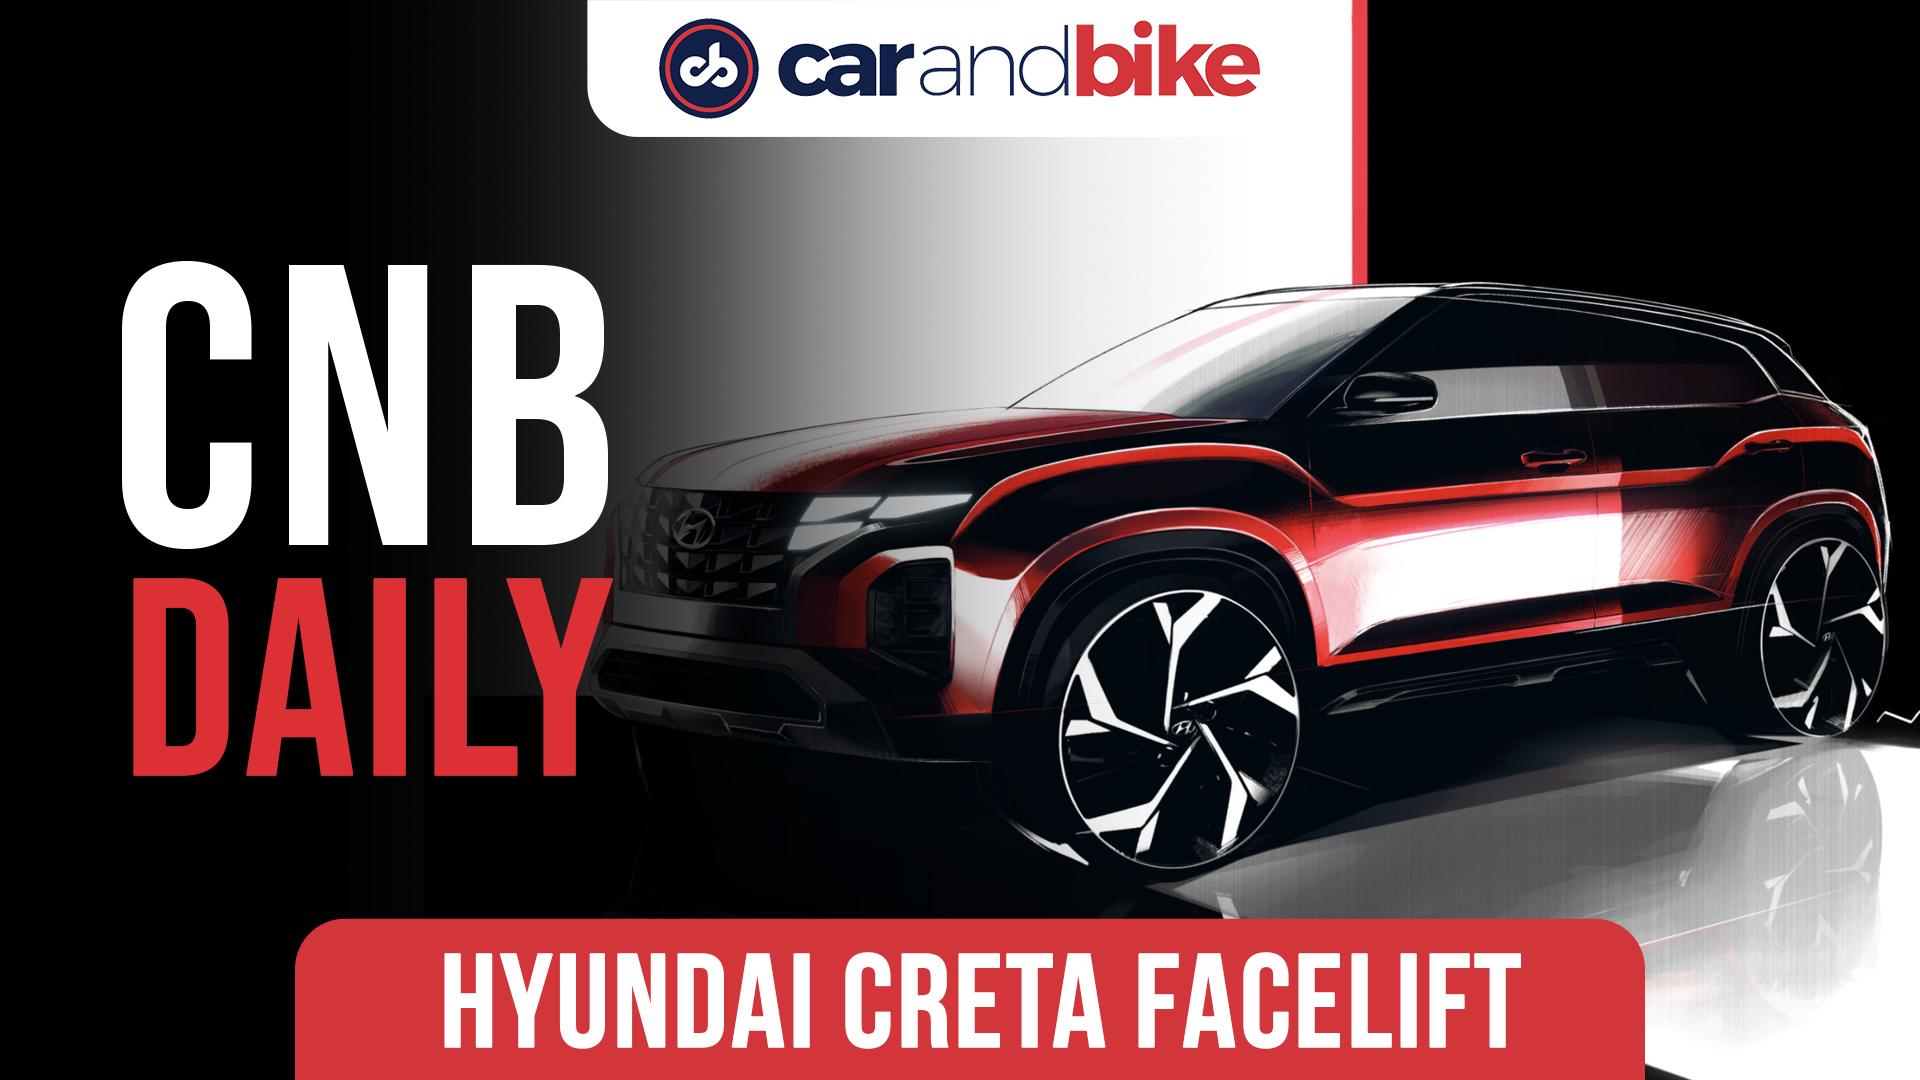 2022 Hyundai Creta Facelift Teased